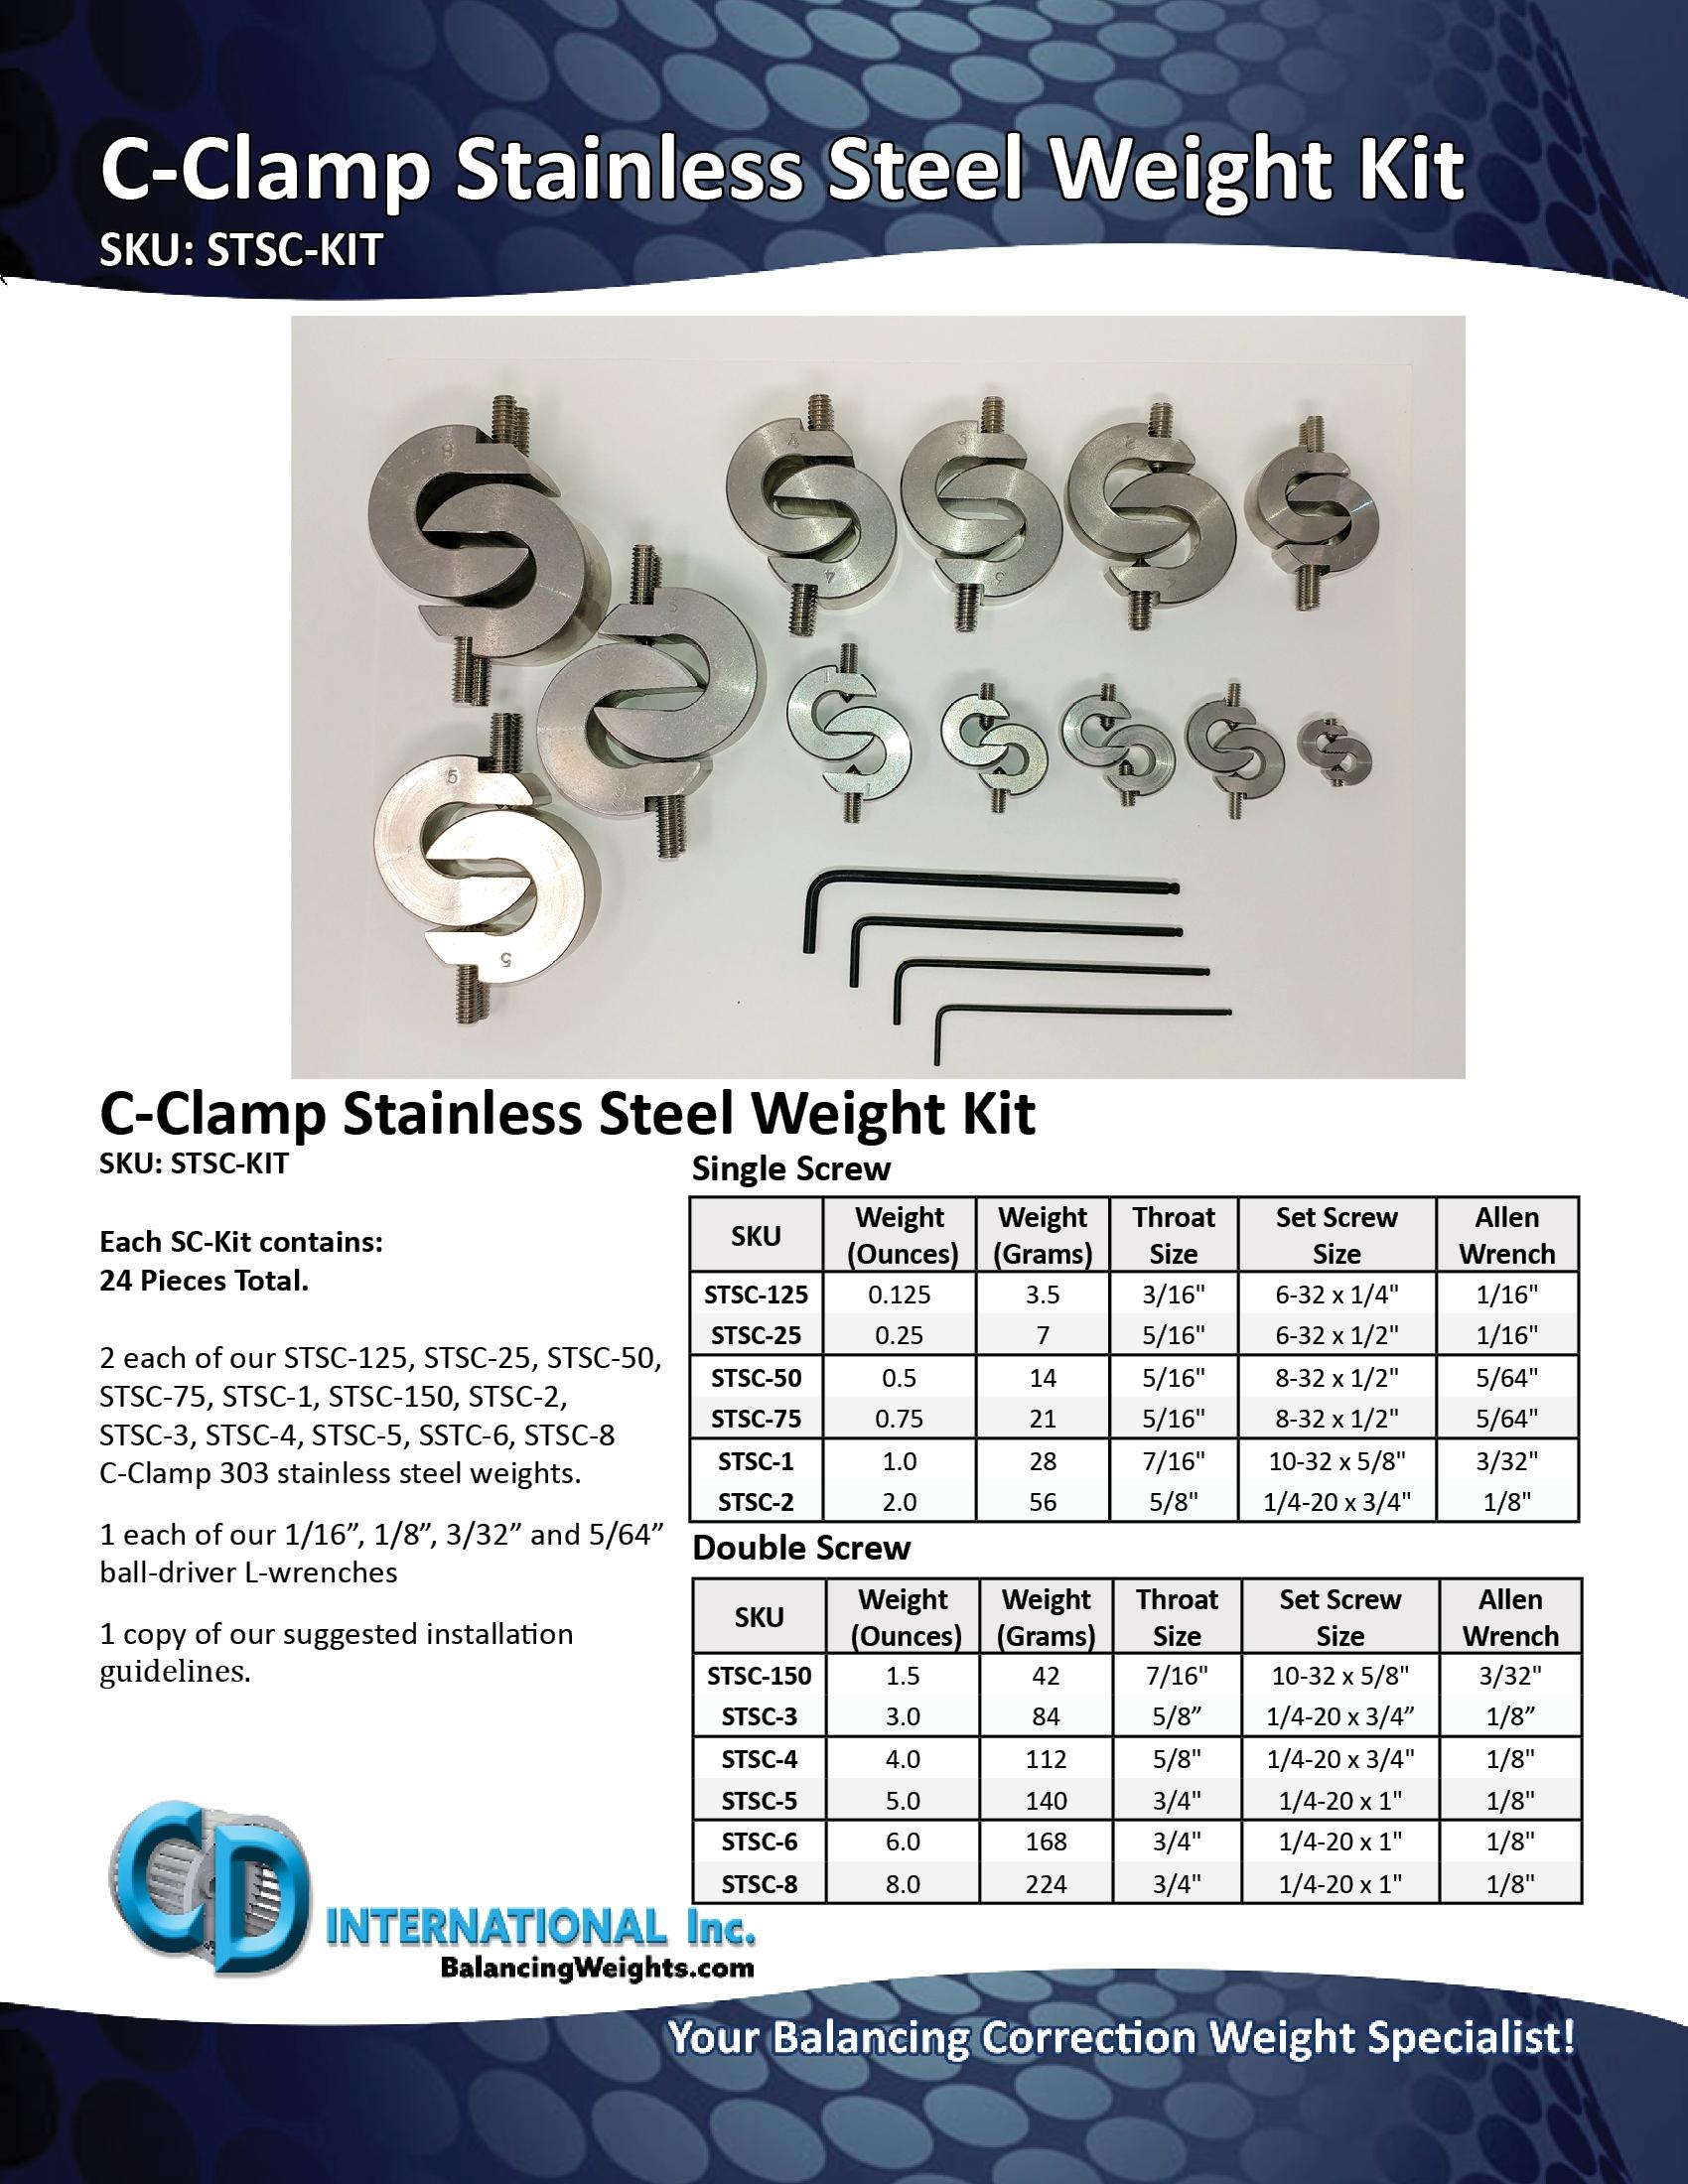 stsc-kit-c-clamp-spec-sheets.jpg